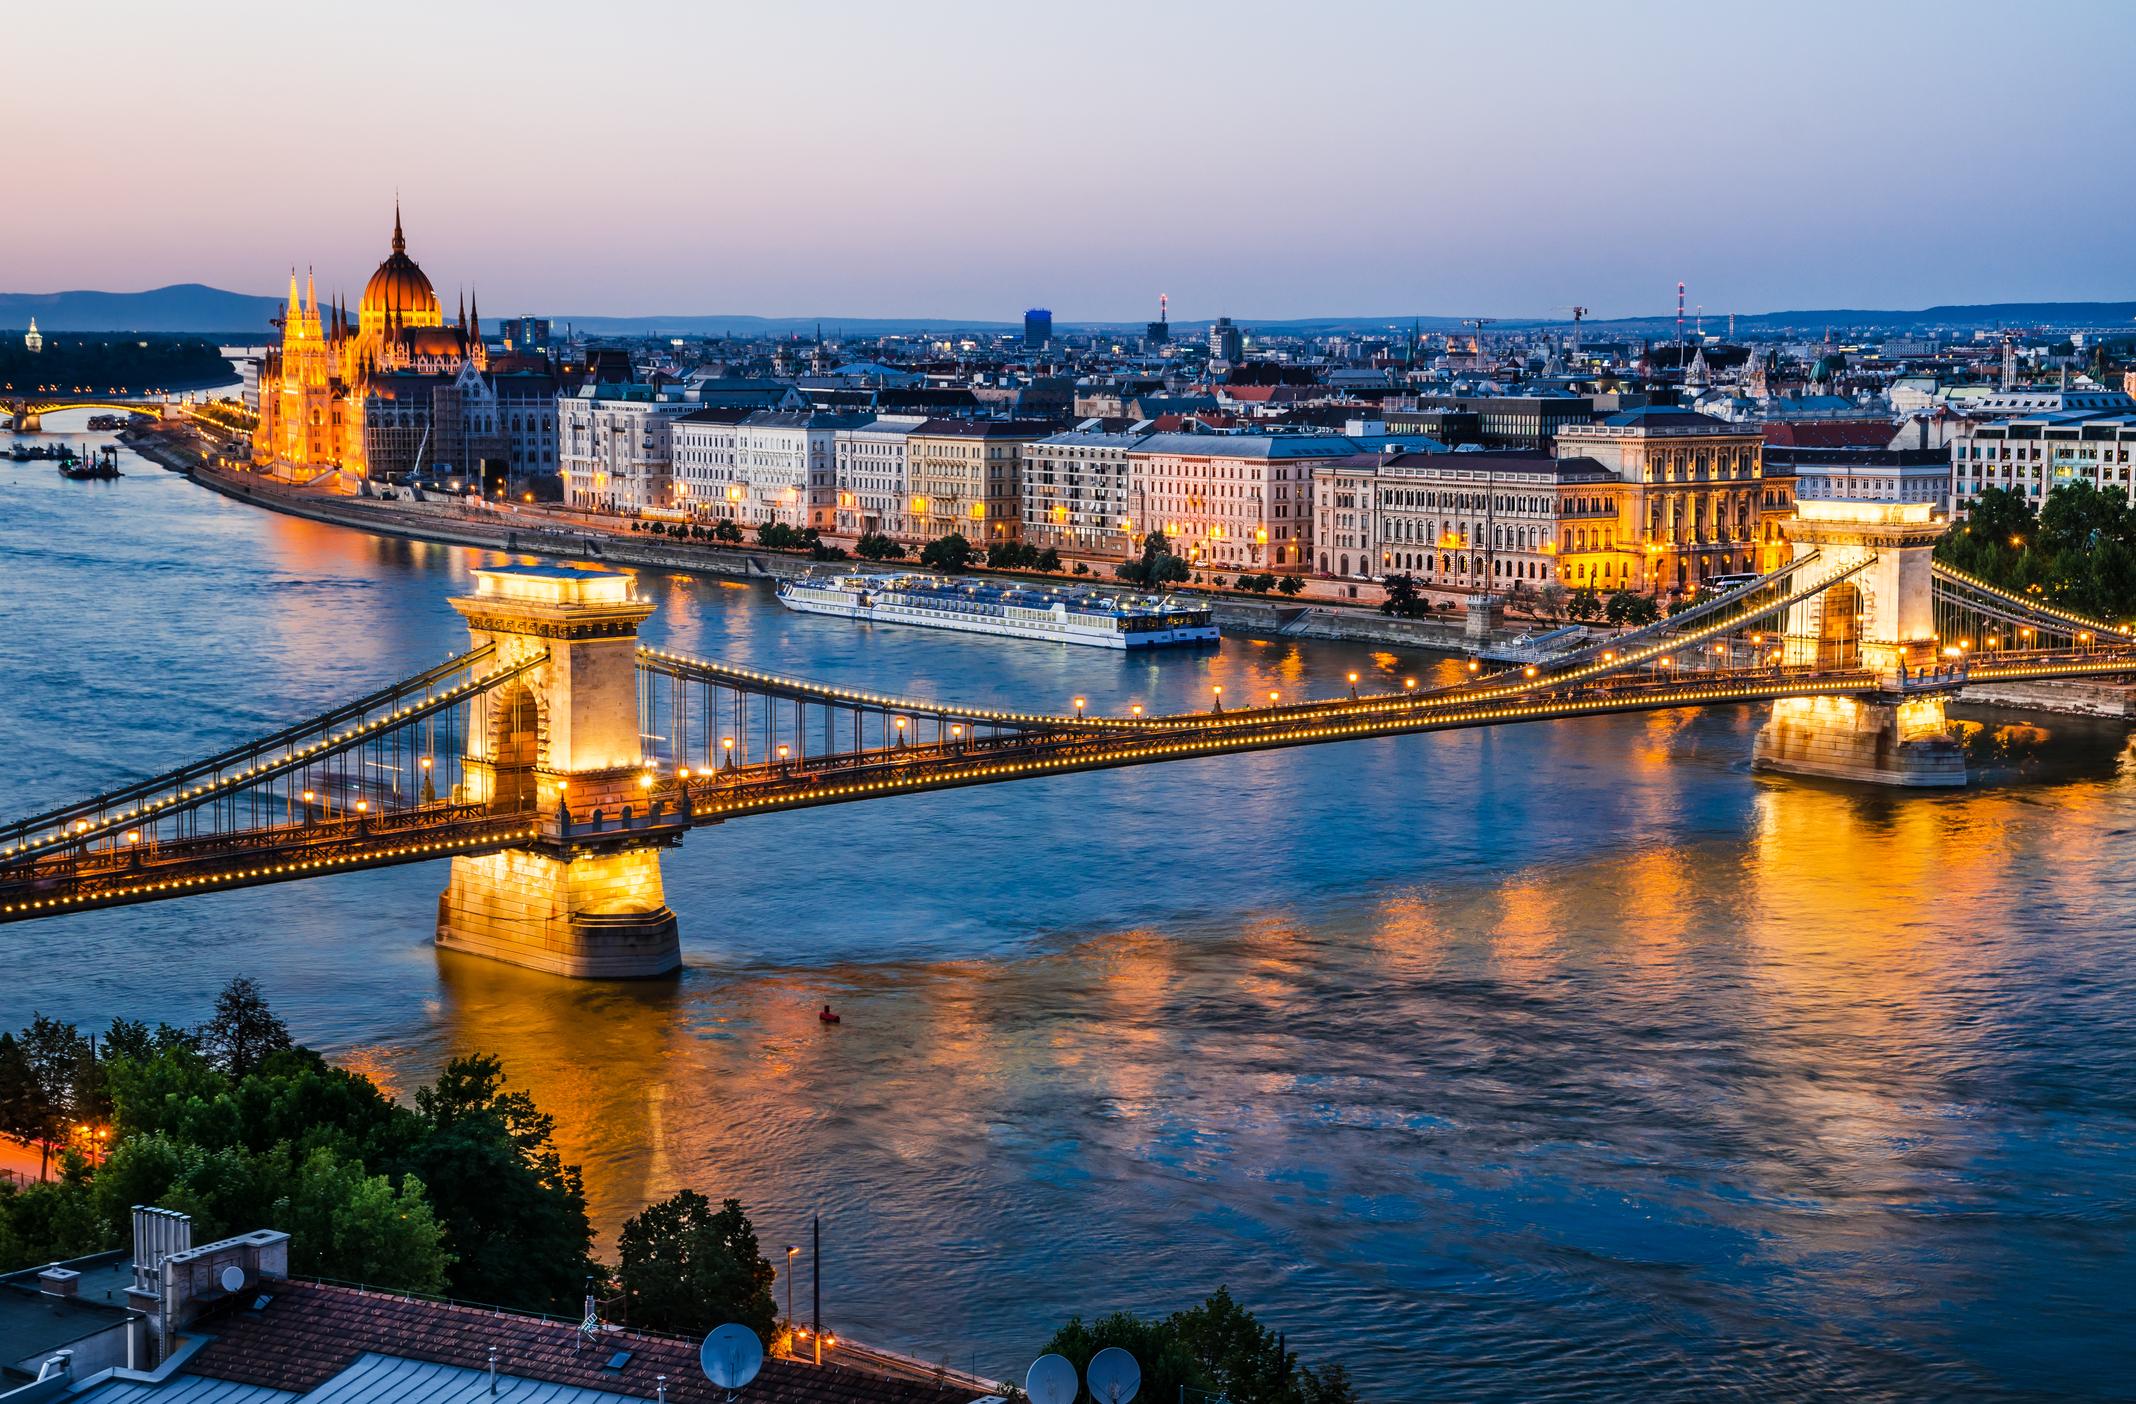 Croisière fluviale en Europe